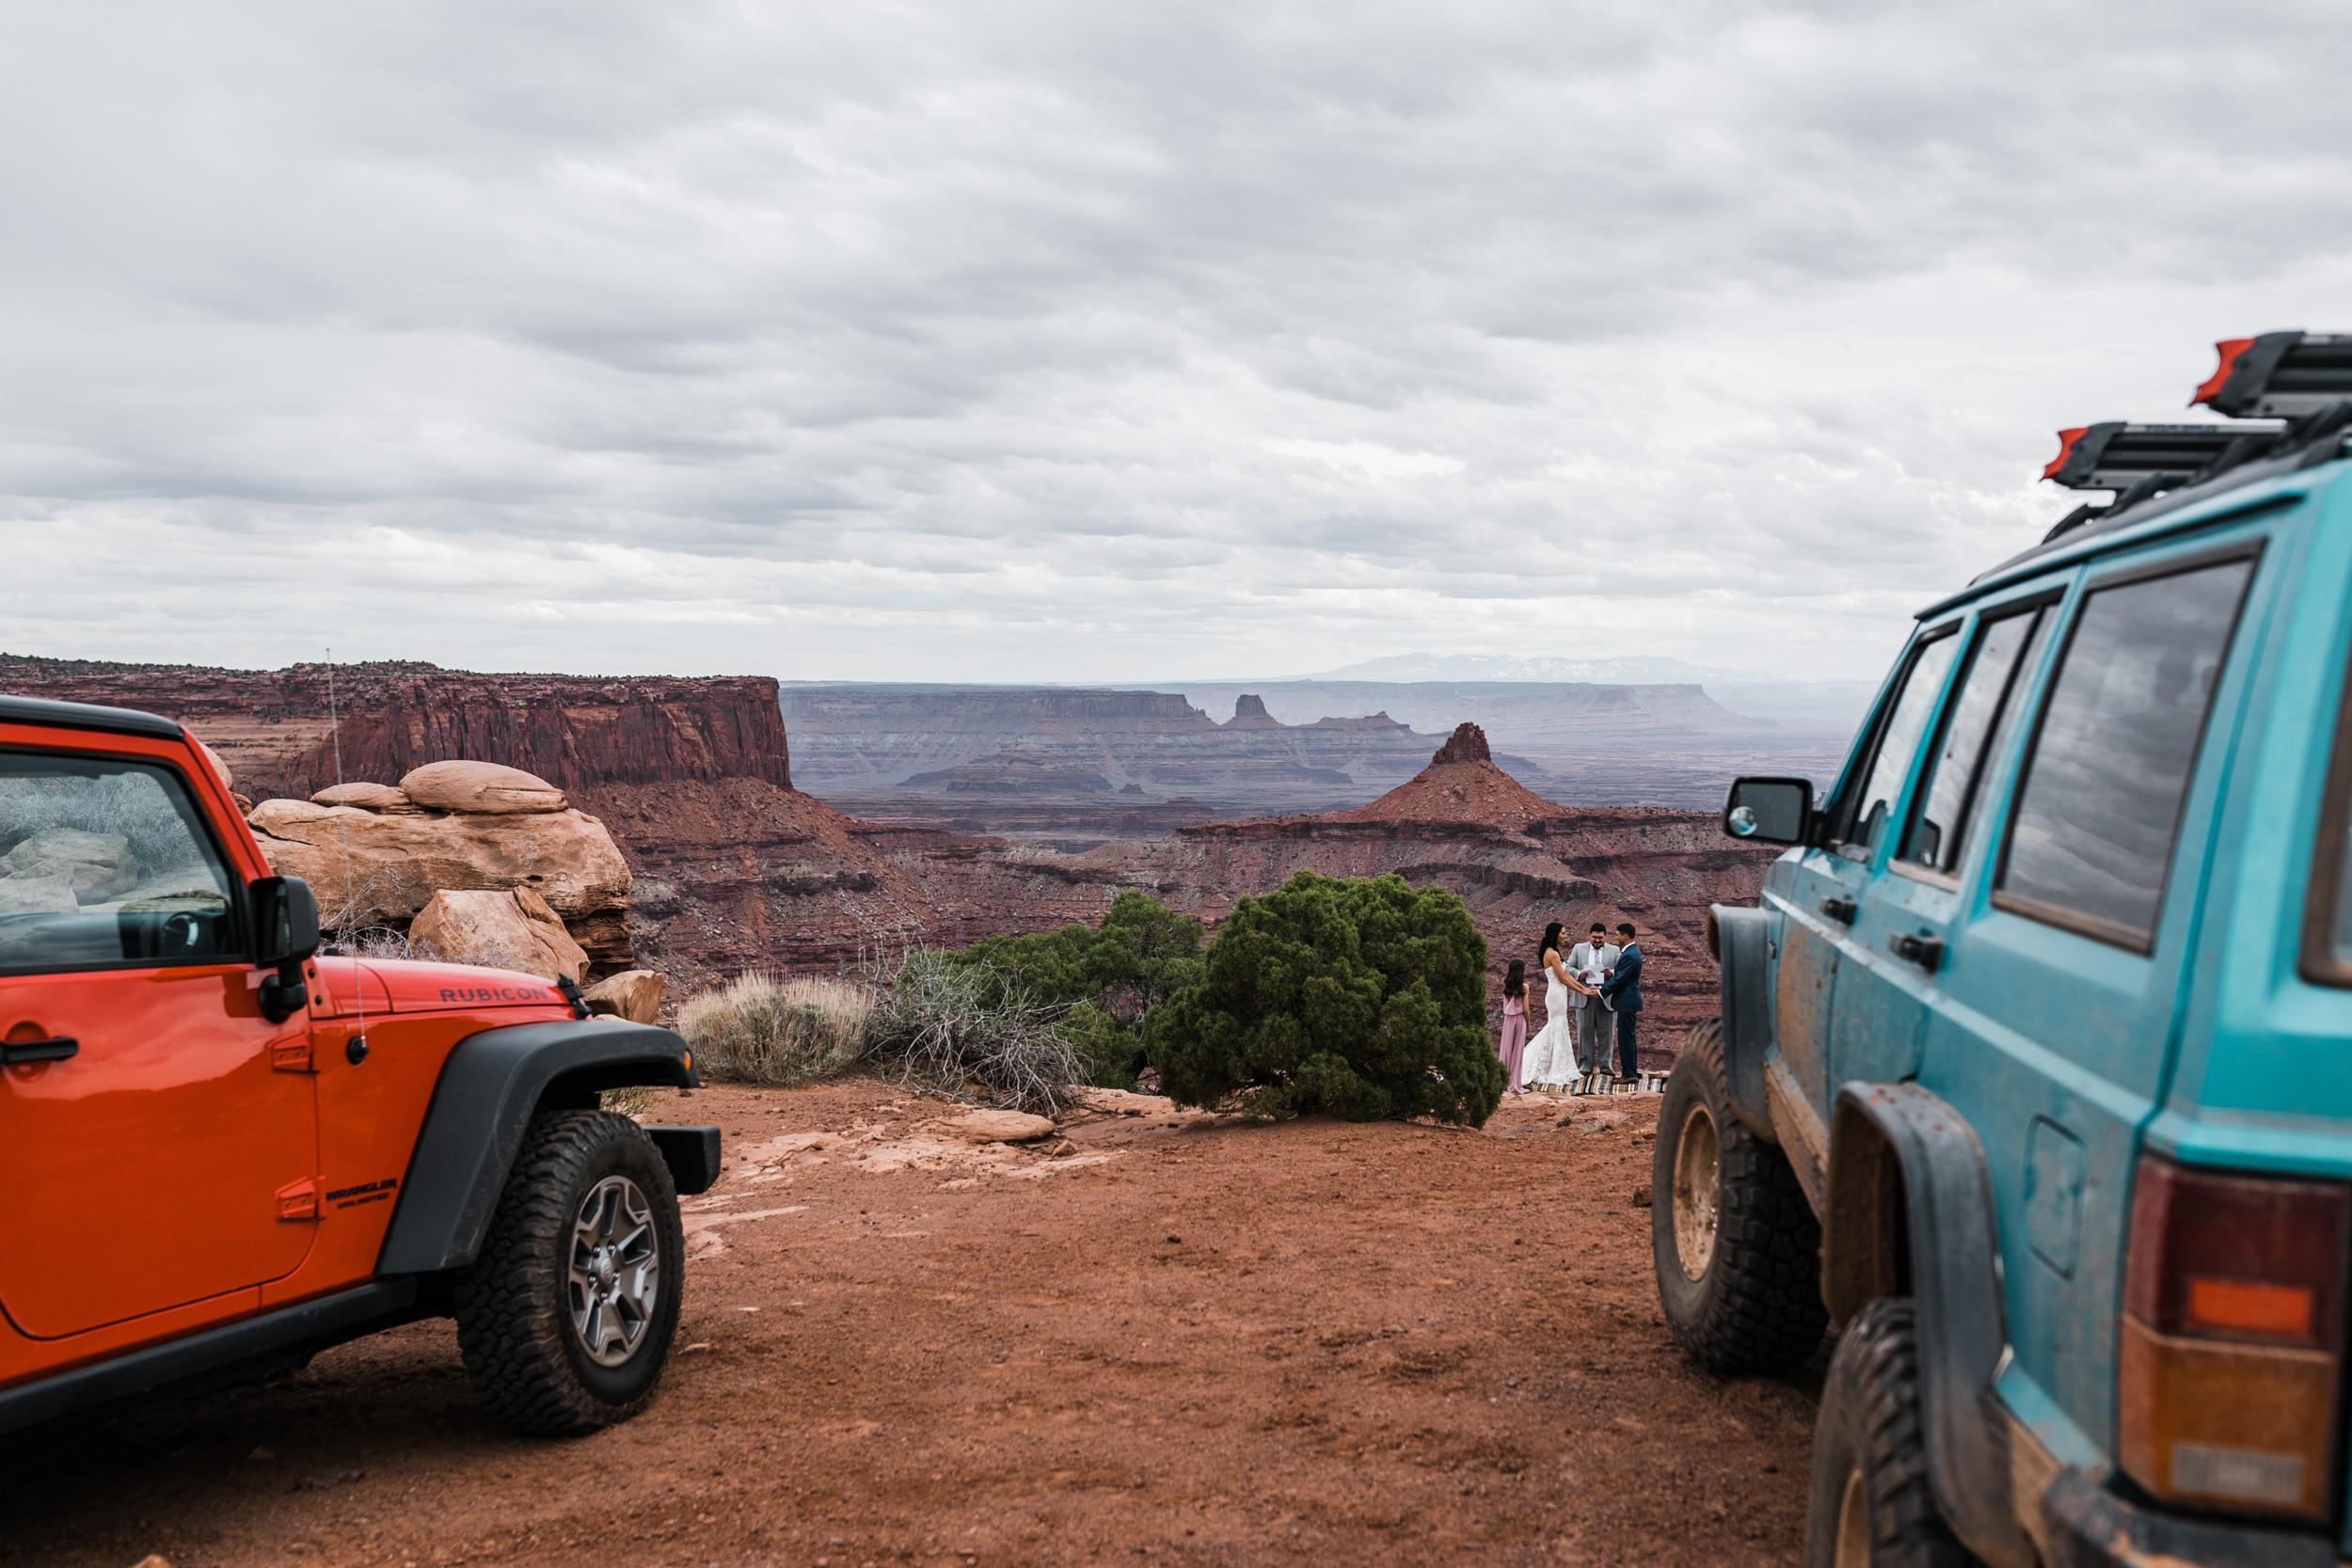 Jeep-Wedding-Moab-Utah-Hearnes-Adventure-Elopement-Photography-8.jpg